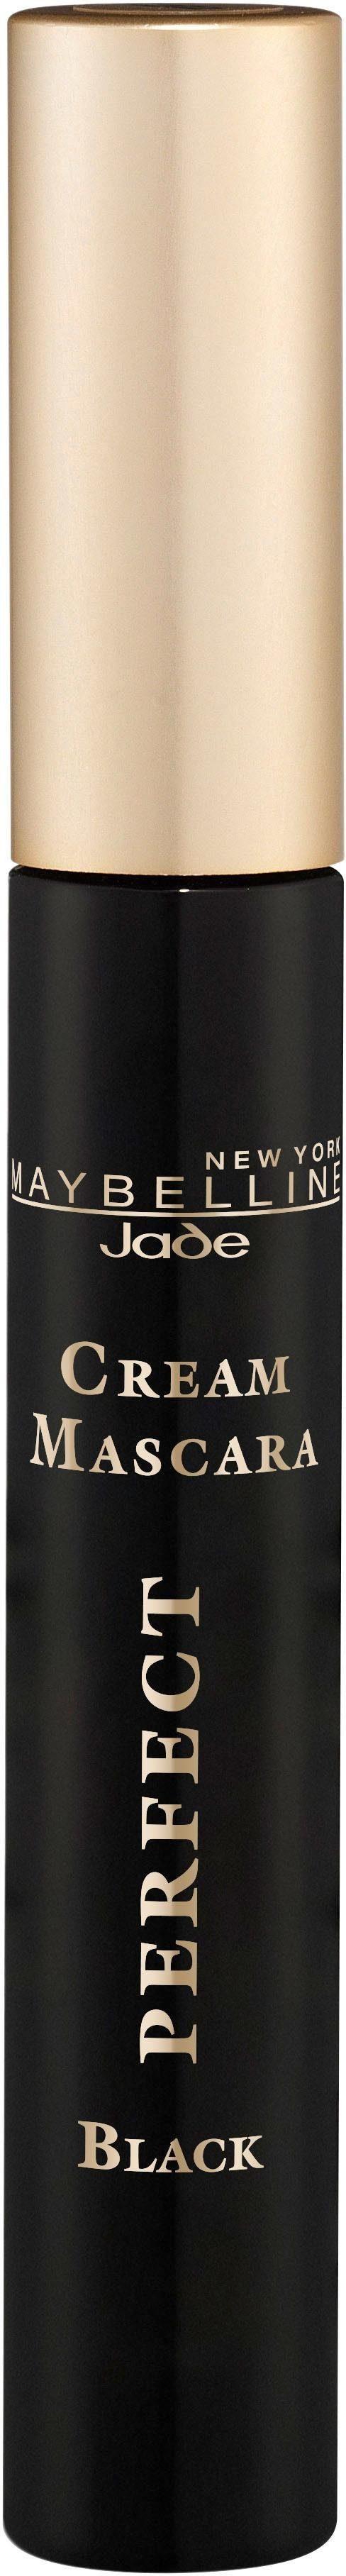 Maybelline New York, »Cream Mascara«, Mascara